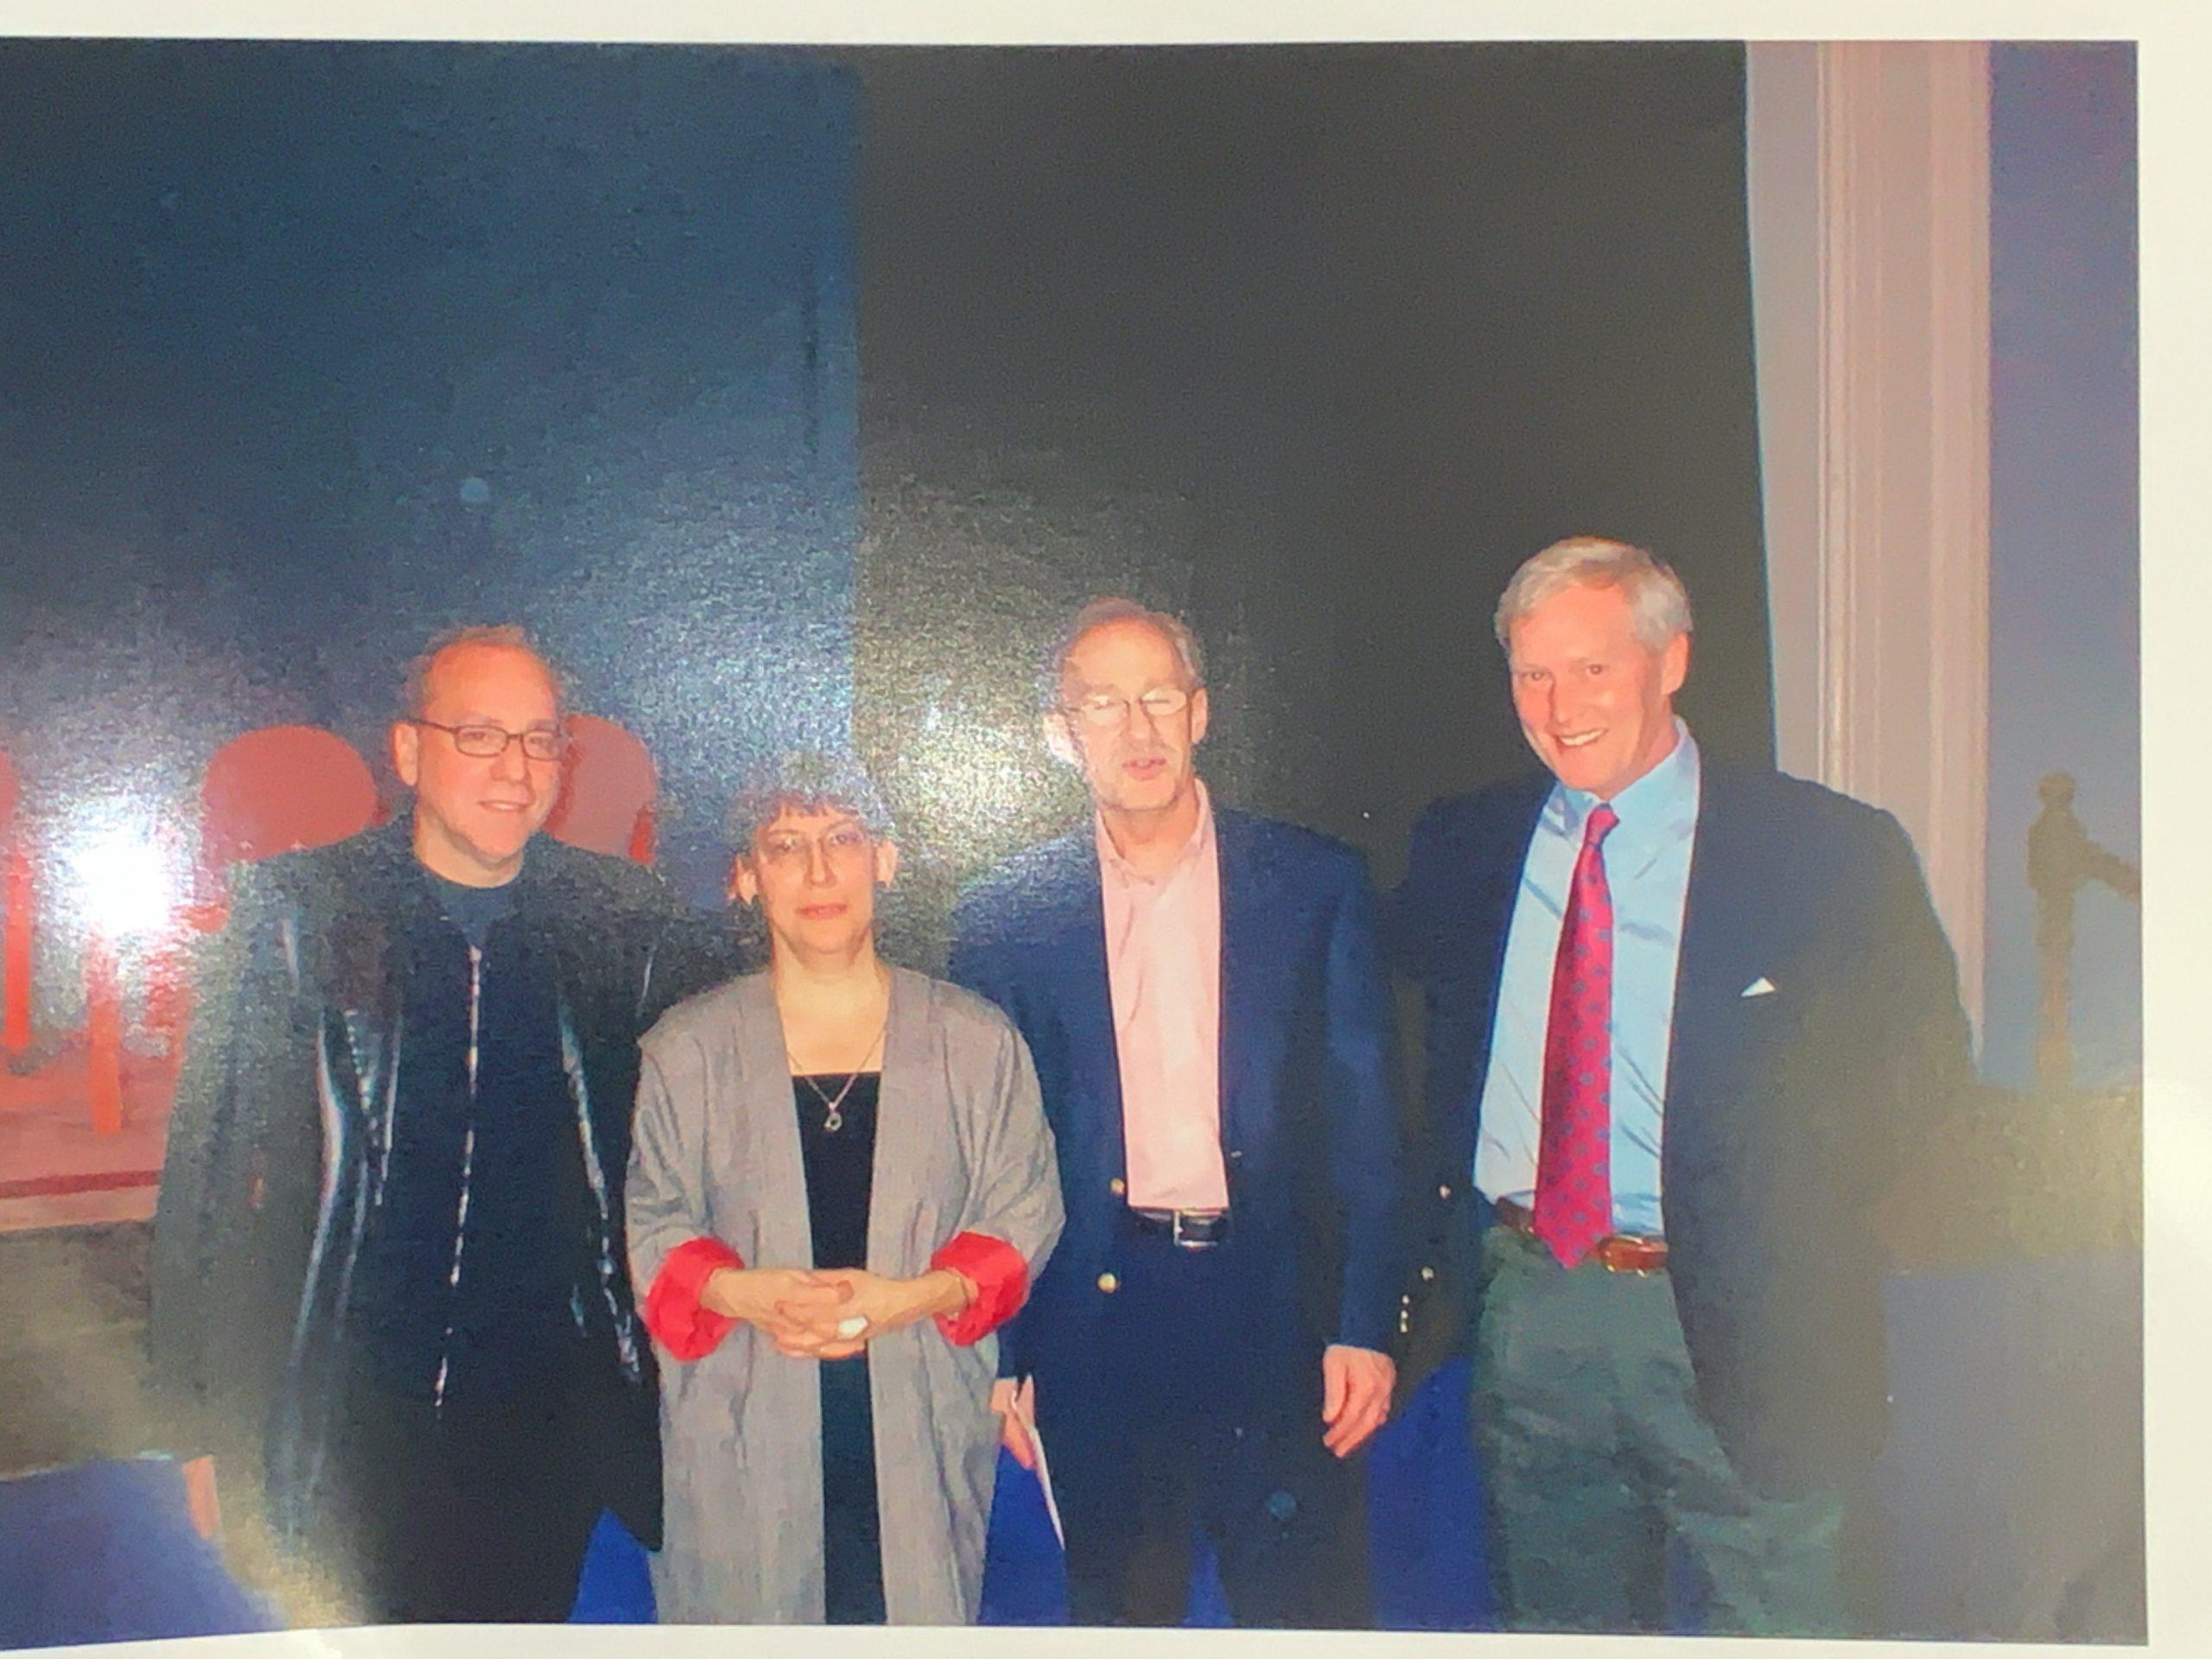 Jonathan Santlofer, SJ Rozan and Brian Haig